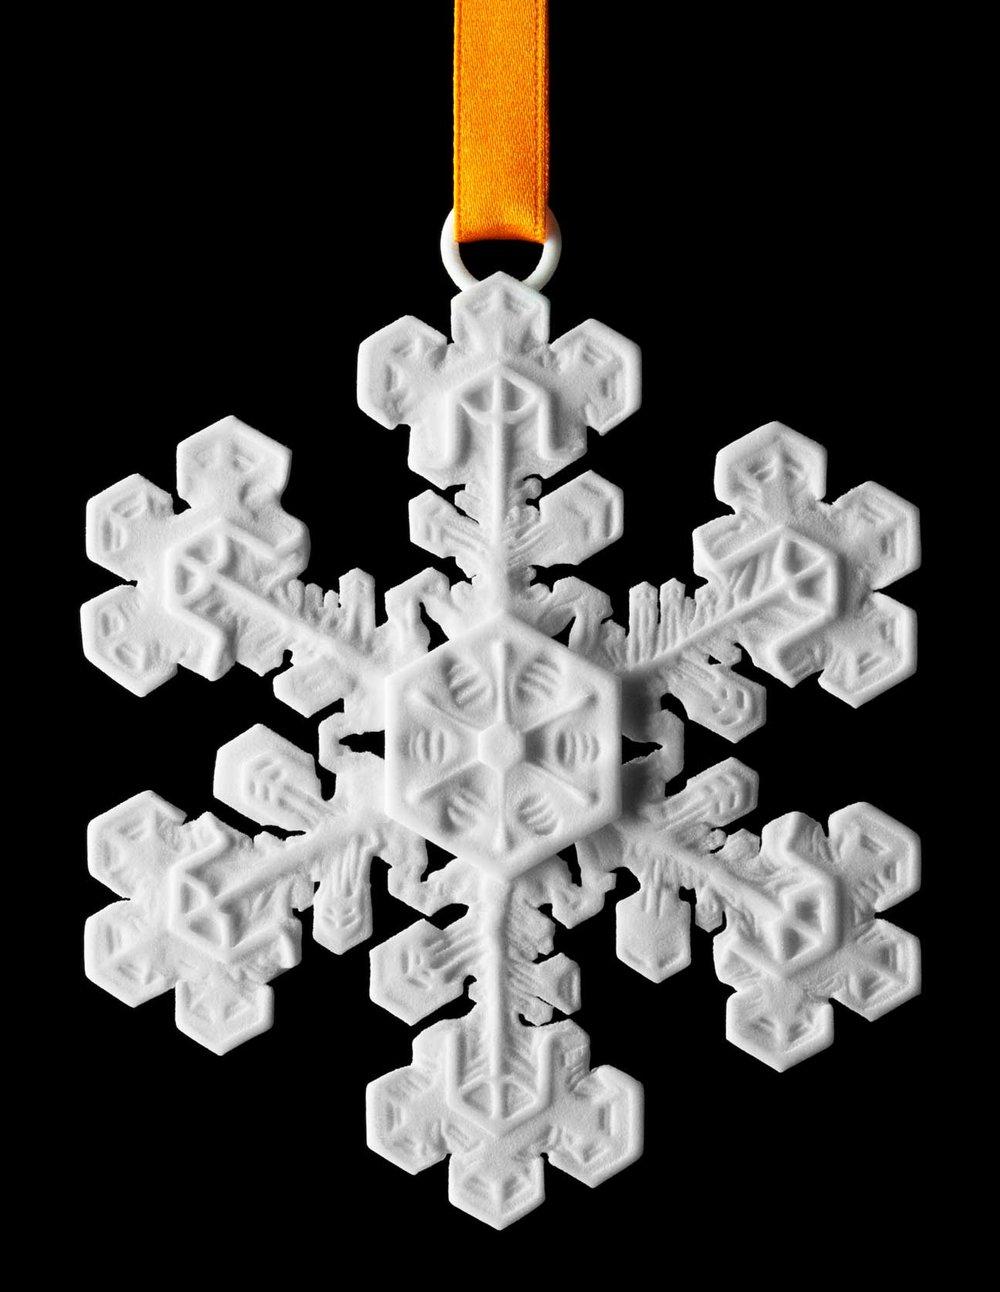 3d printed snowflake 2018